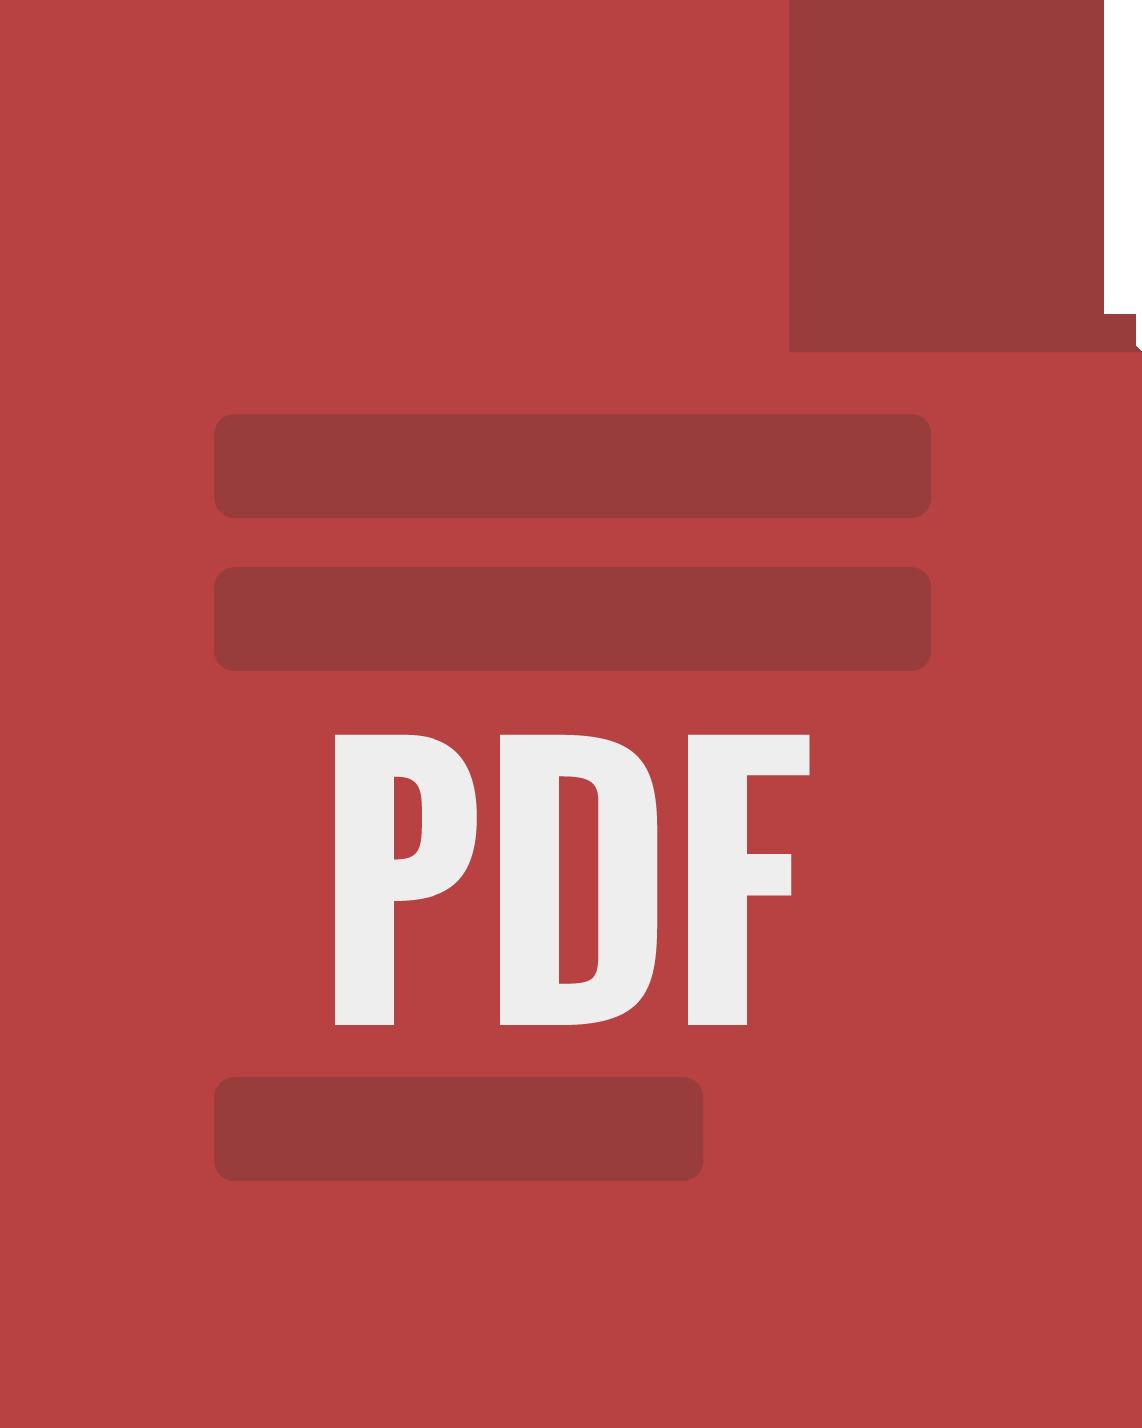 Cara Buka File Coreldraw X7 Di Semua Versi X3 X4 X5 X6 Tanpa Id 5dc08ab50001c